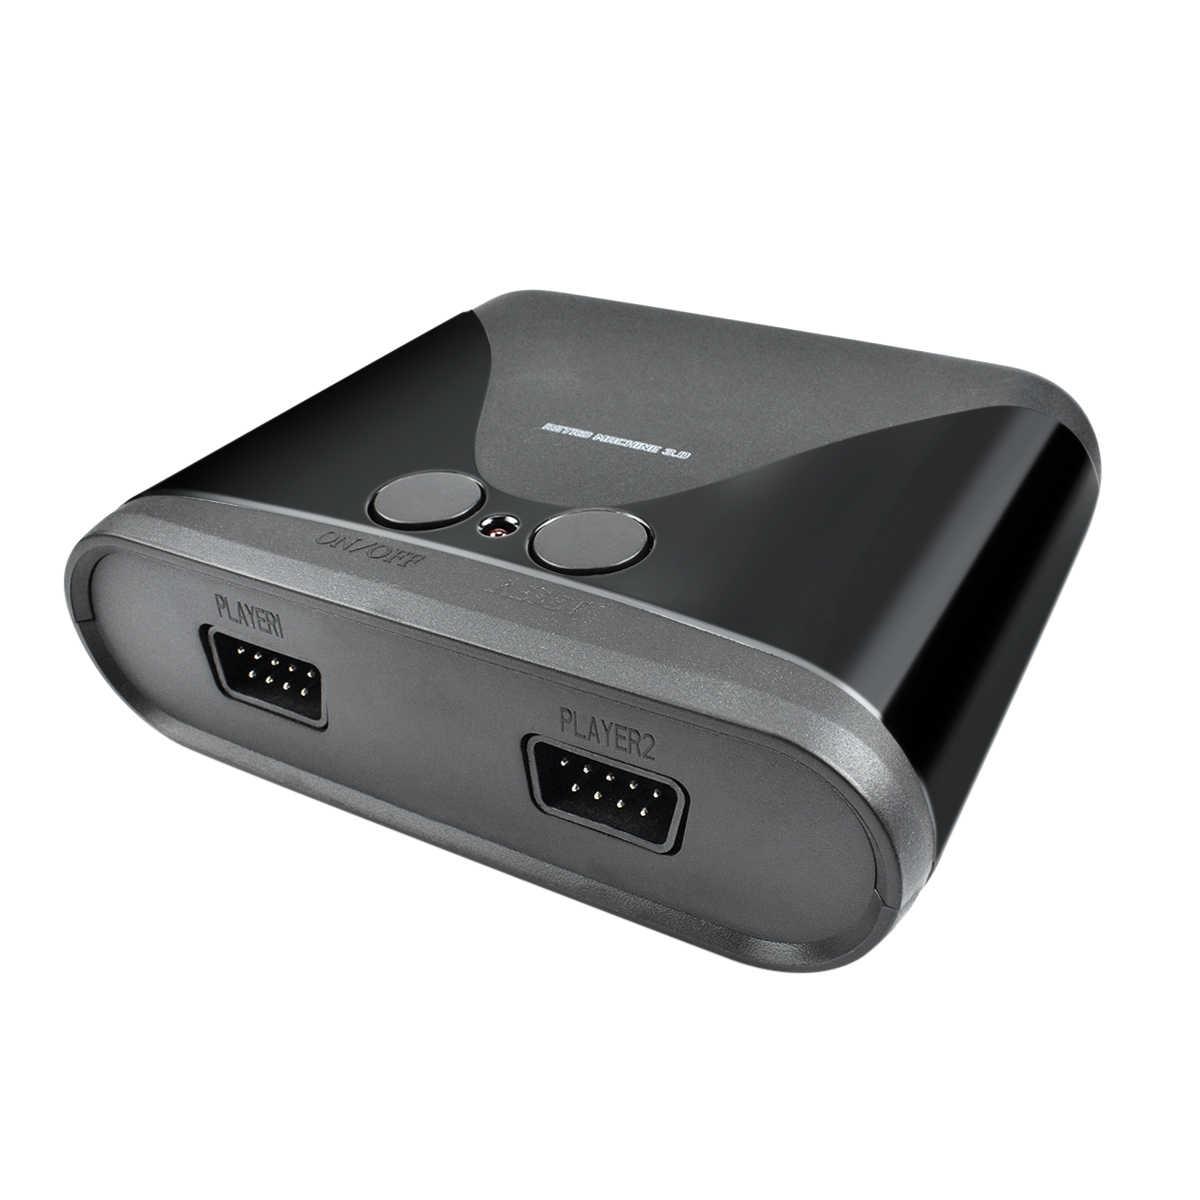 Bonacell 2019 חדש רטרו מיני טלוויזיה וידאו קונסולת משחקים עבור AVH 16 קצת משחקים עם 68 שונה Built-ב משחקים שני Gamepads AV החוצה L50